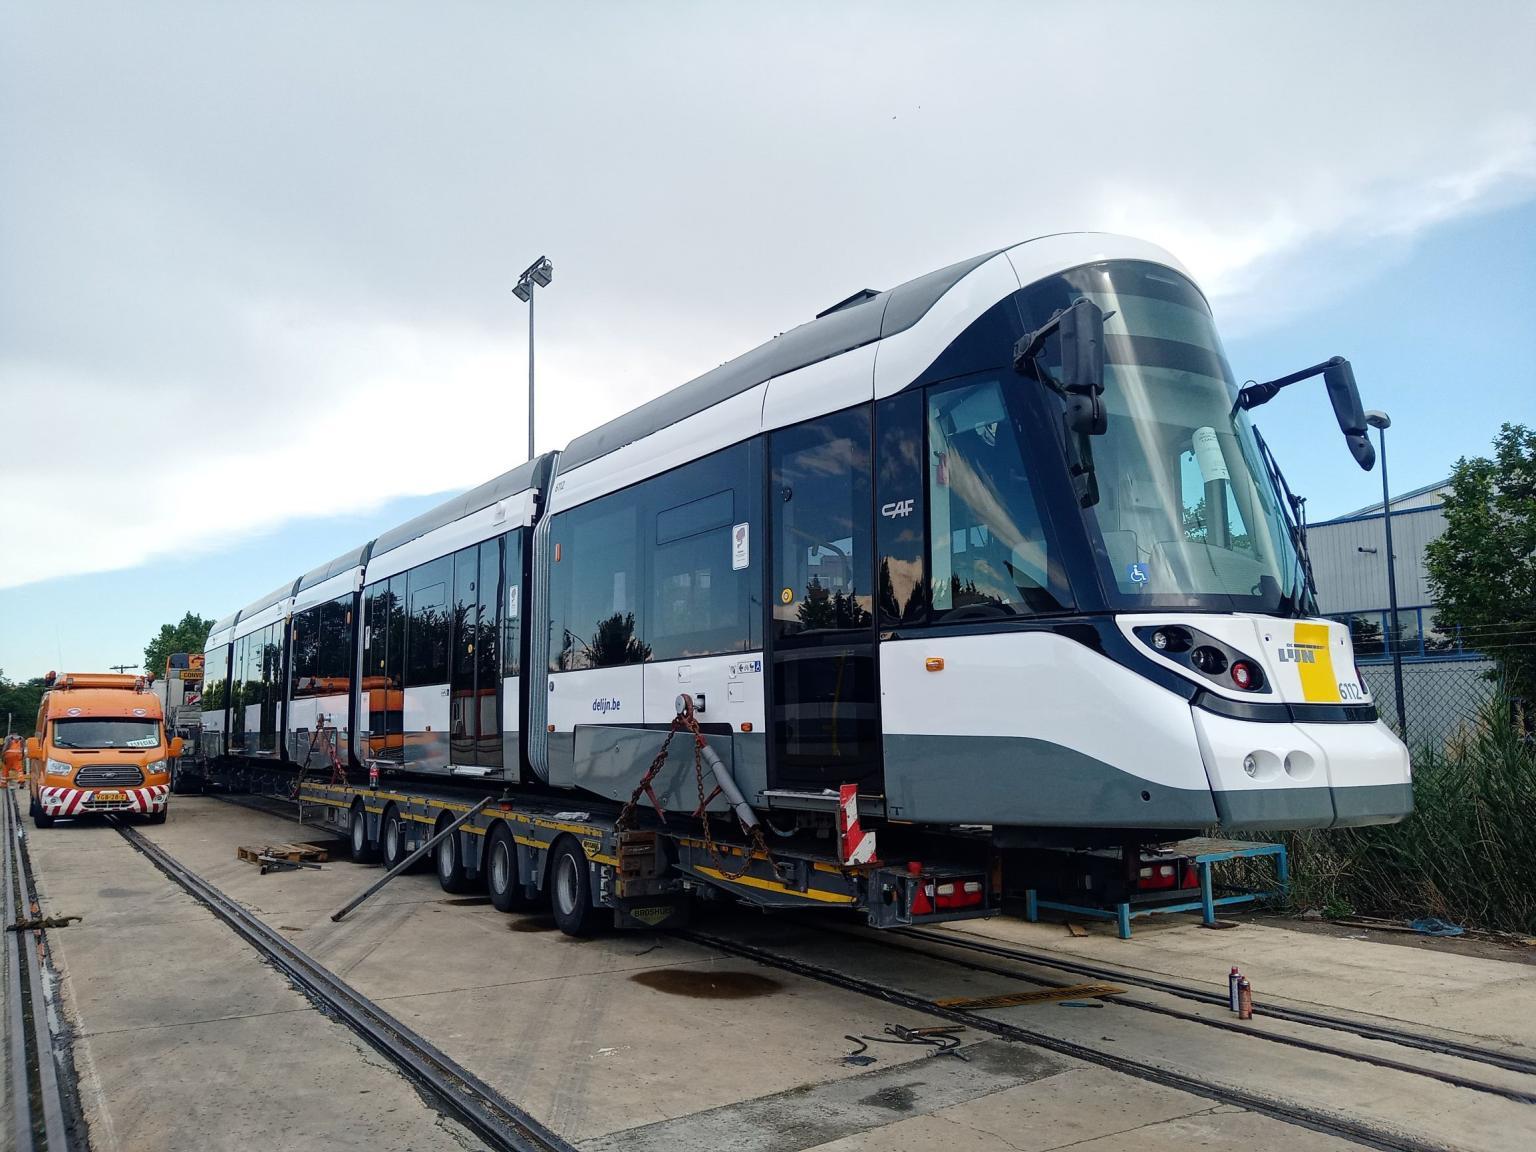 https://www.urban-transport-magazine.com/wp-content/uploads/2020/06/123-de-lijn.jpeg